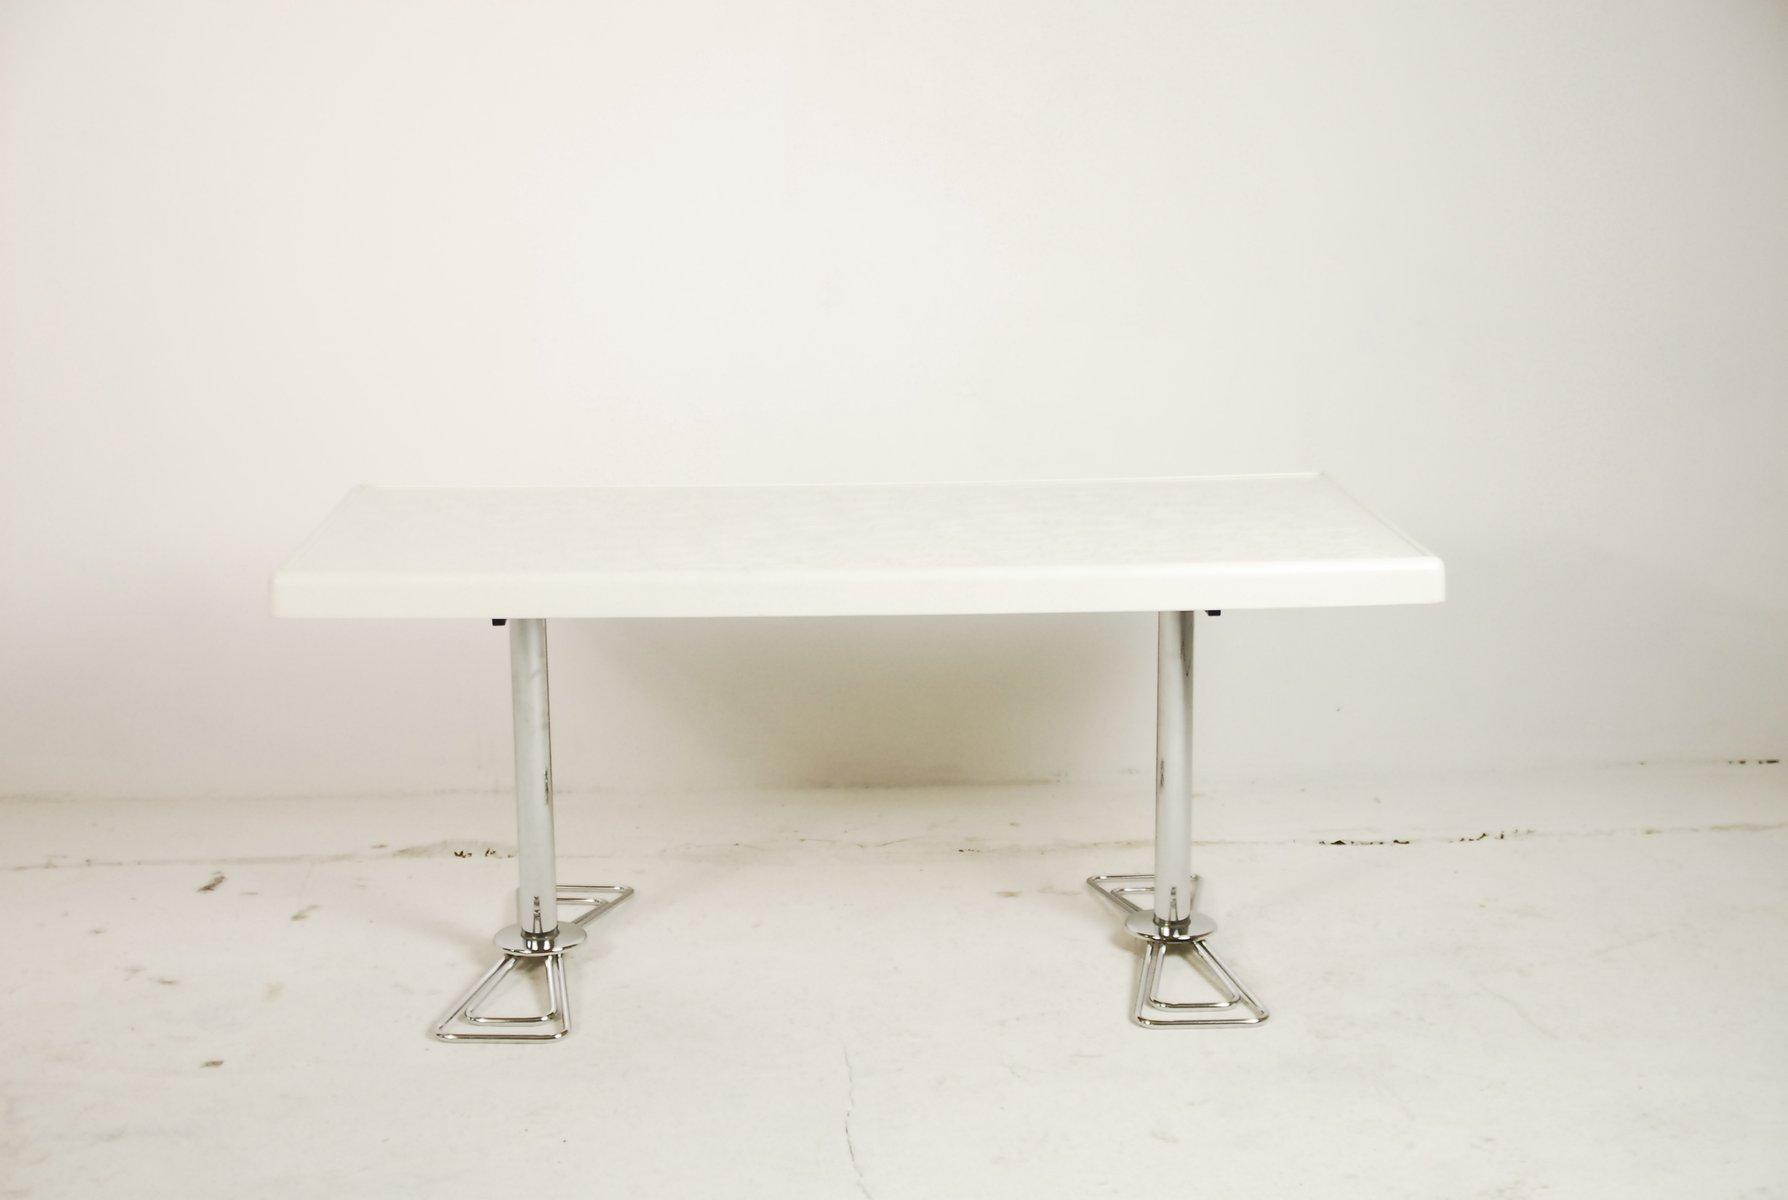 table basse futuriste 1980s en vente sur pamono. Black Bedroom Furniture Sets. Home Design Ideas